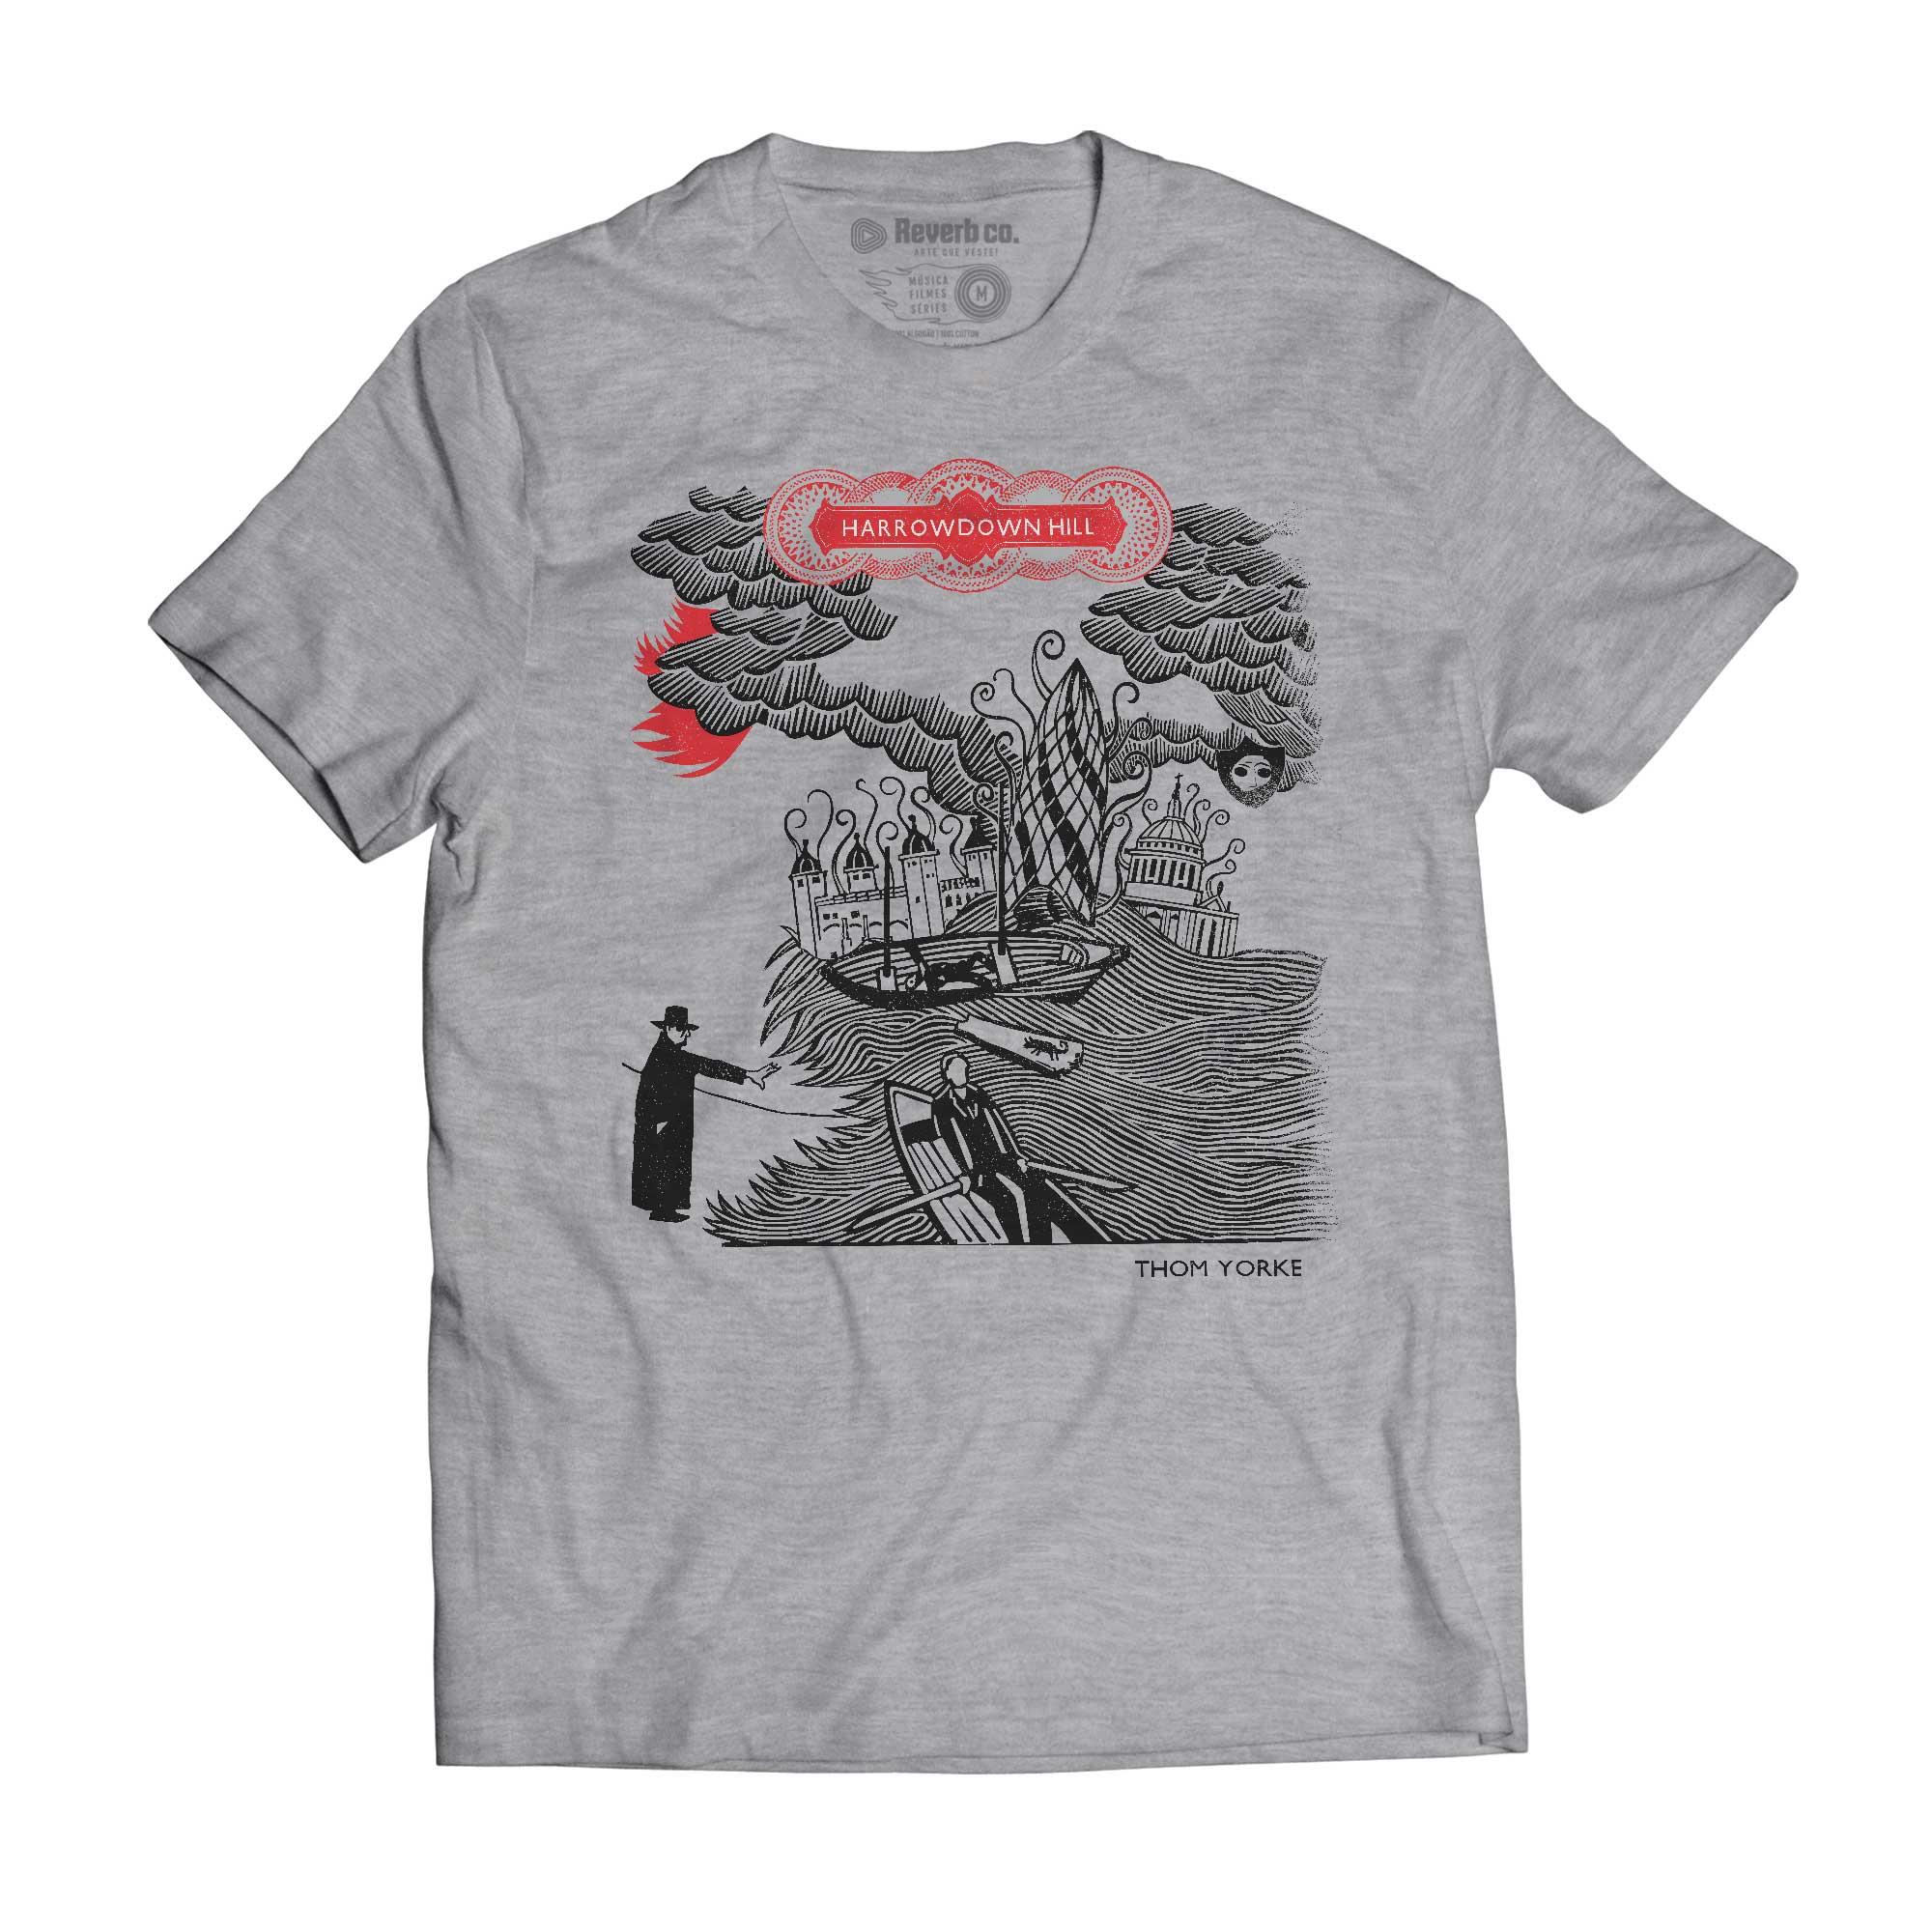 Camiseta Harrowdown Hill - Thom Yorke - Masculino